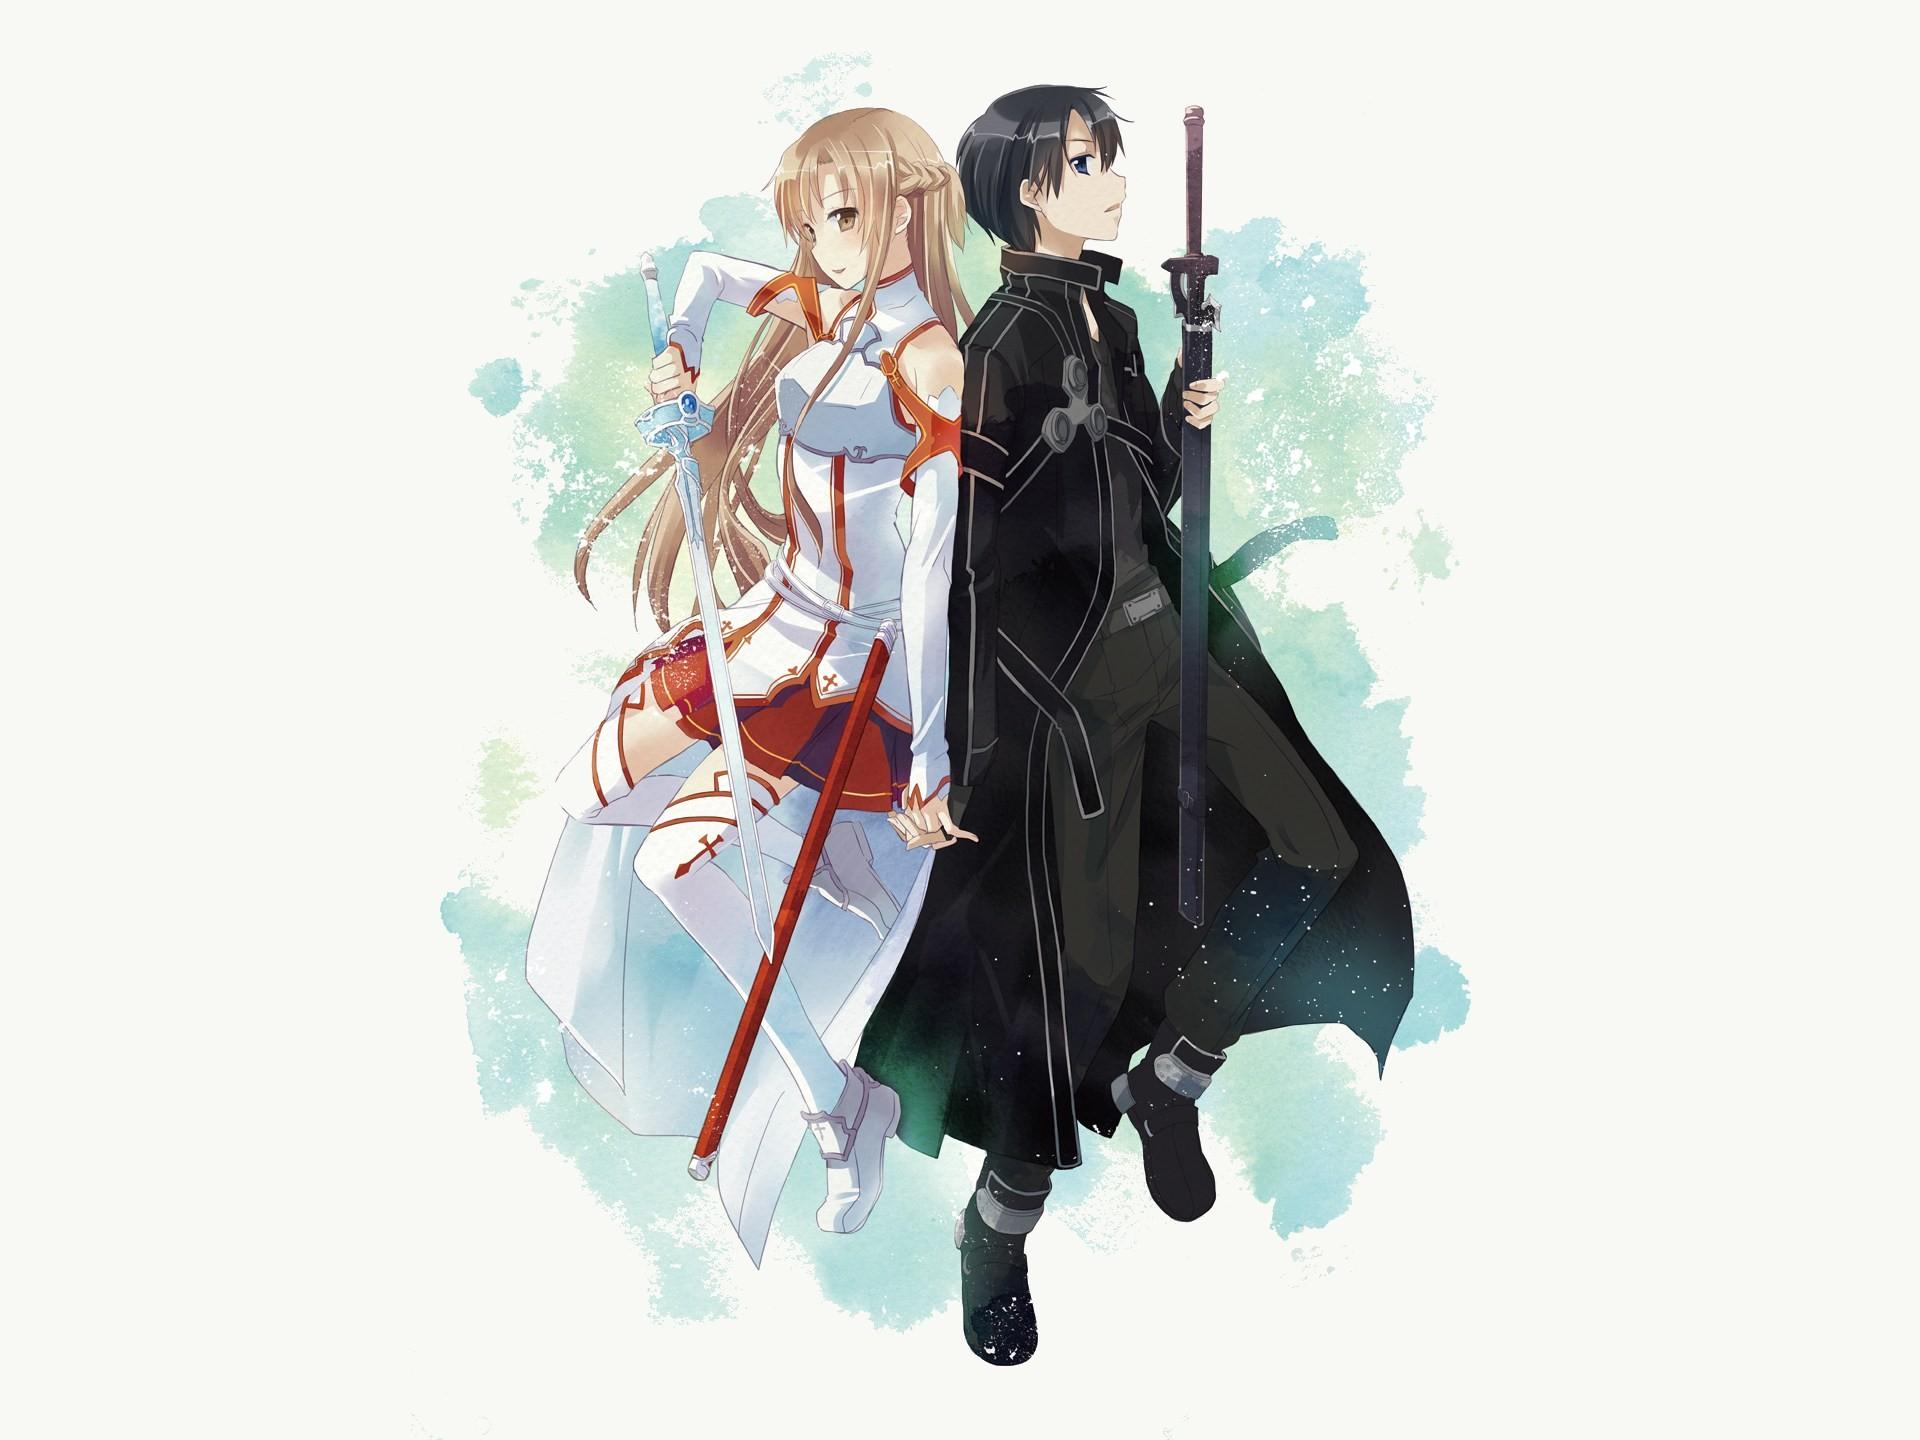 Sword Art Online Hd Wallpaper Hintergrund 1920x1440 Id